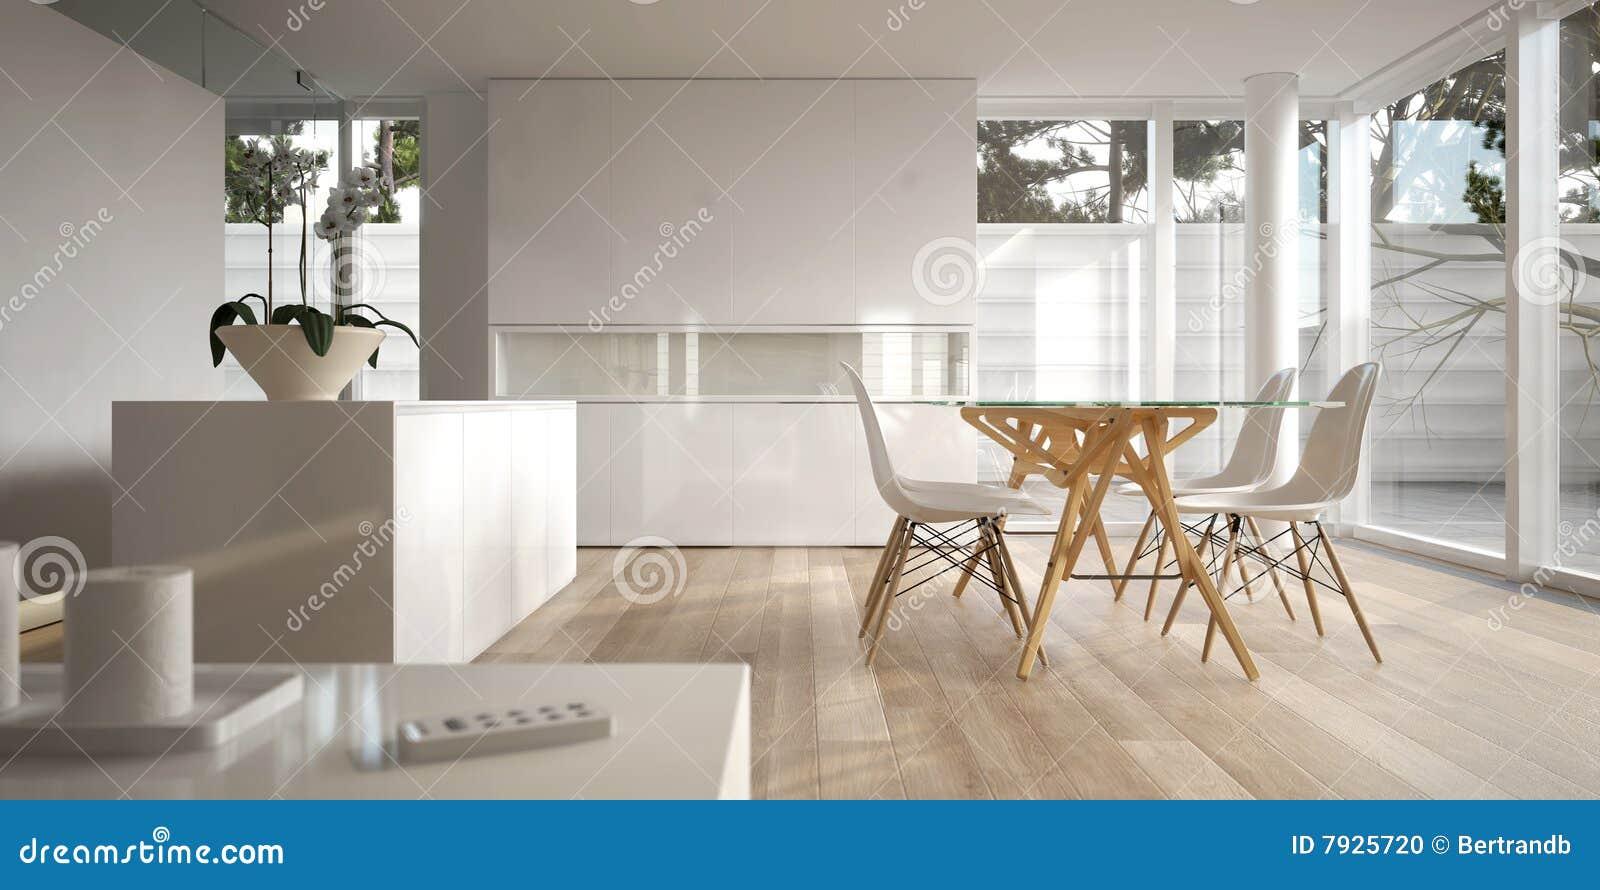 Tegelverf In De Badkamer ~ Woonkamer Eettafel  Moderne woonkamer met eettafel, buffet en 3D